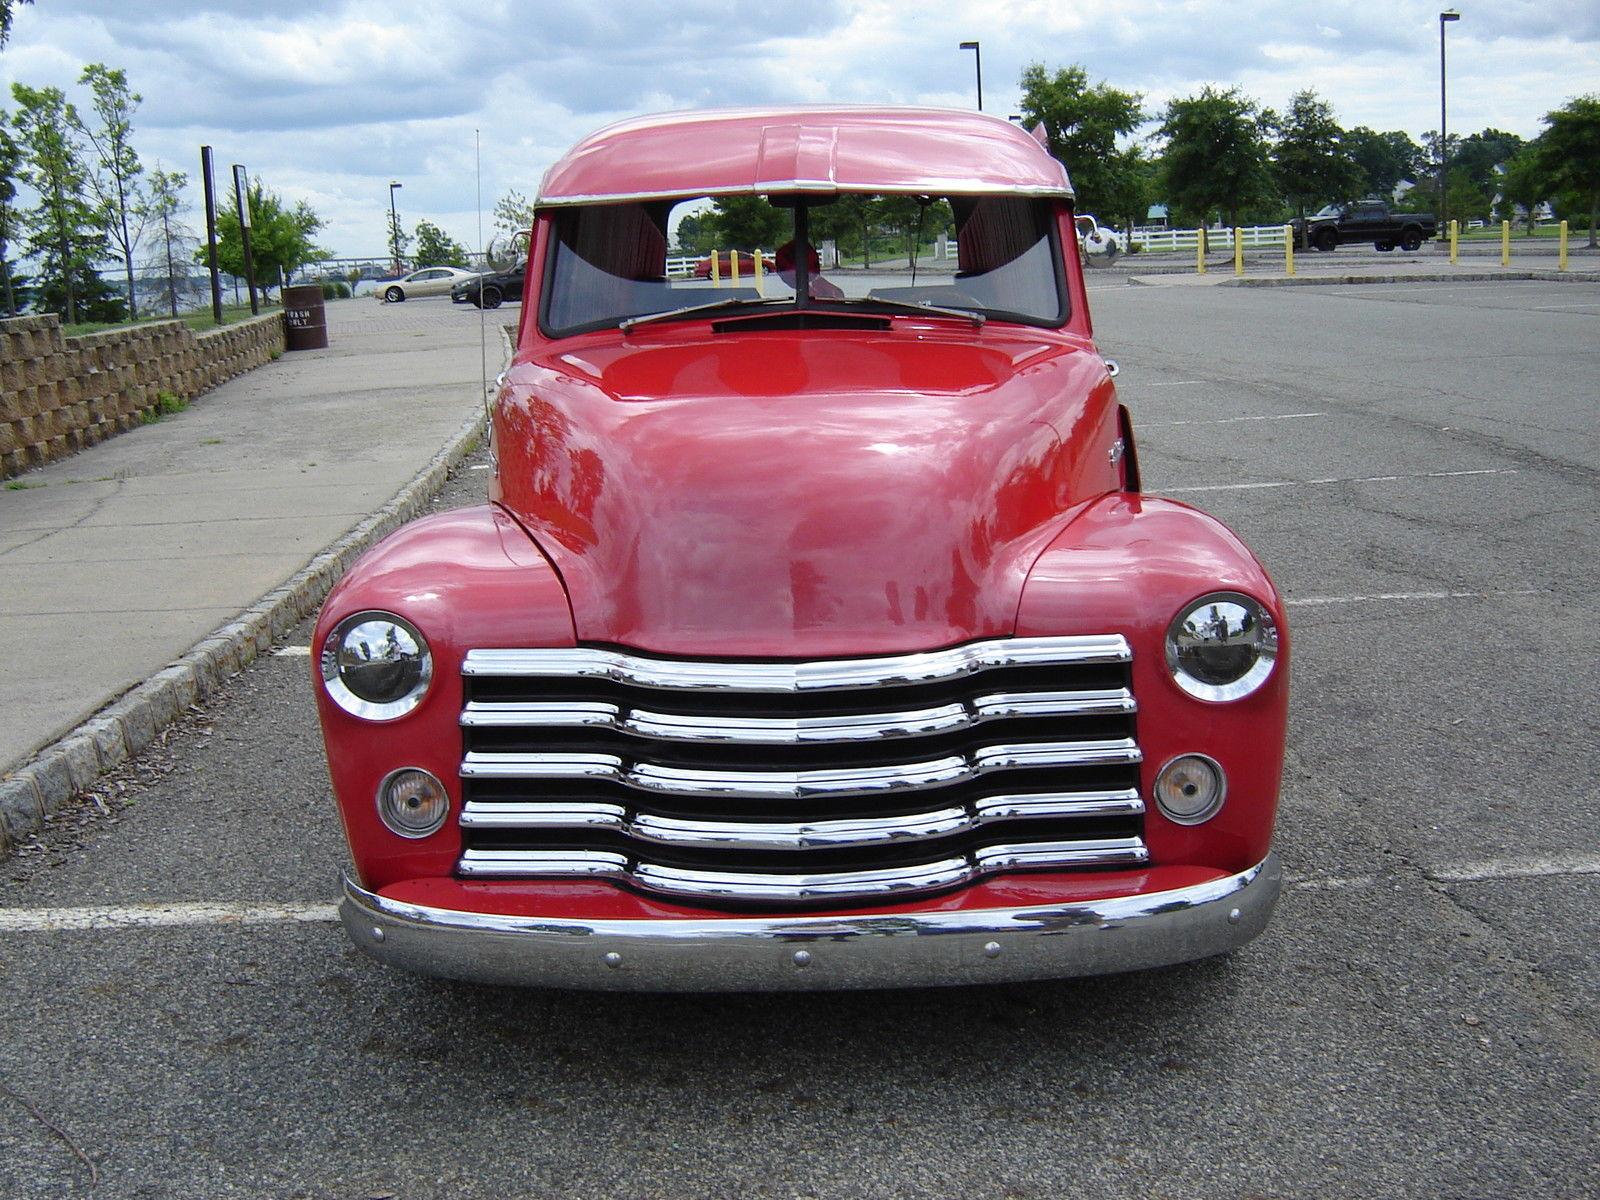 1949 Chevrolet Truck 3100 Panel Chevy Sedan Delivery